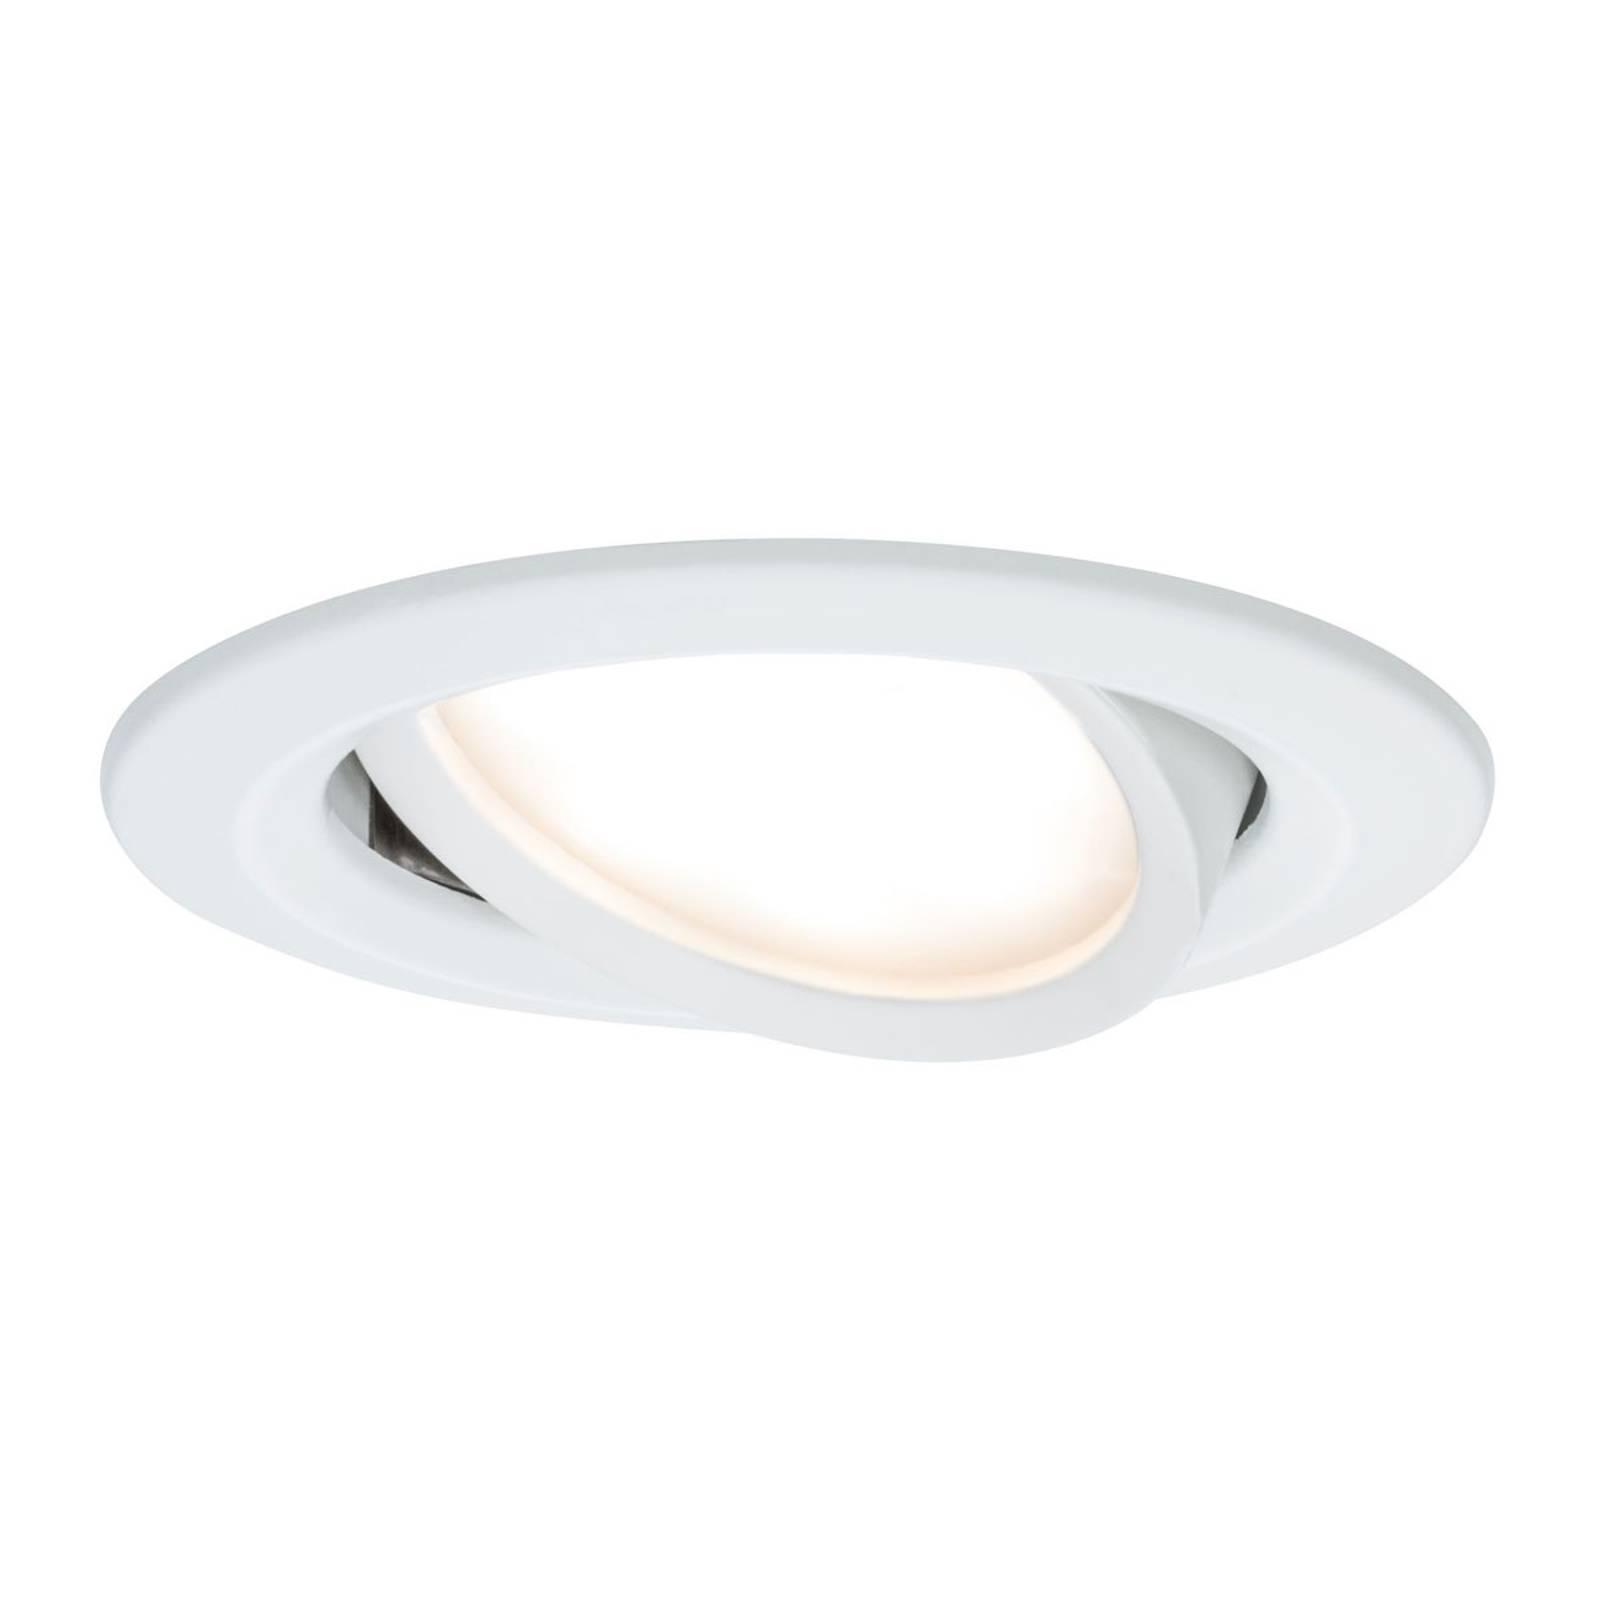 Paulmann Nova Coin faretto LED tondo, bianco